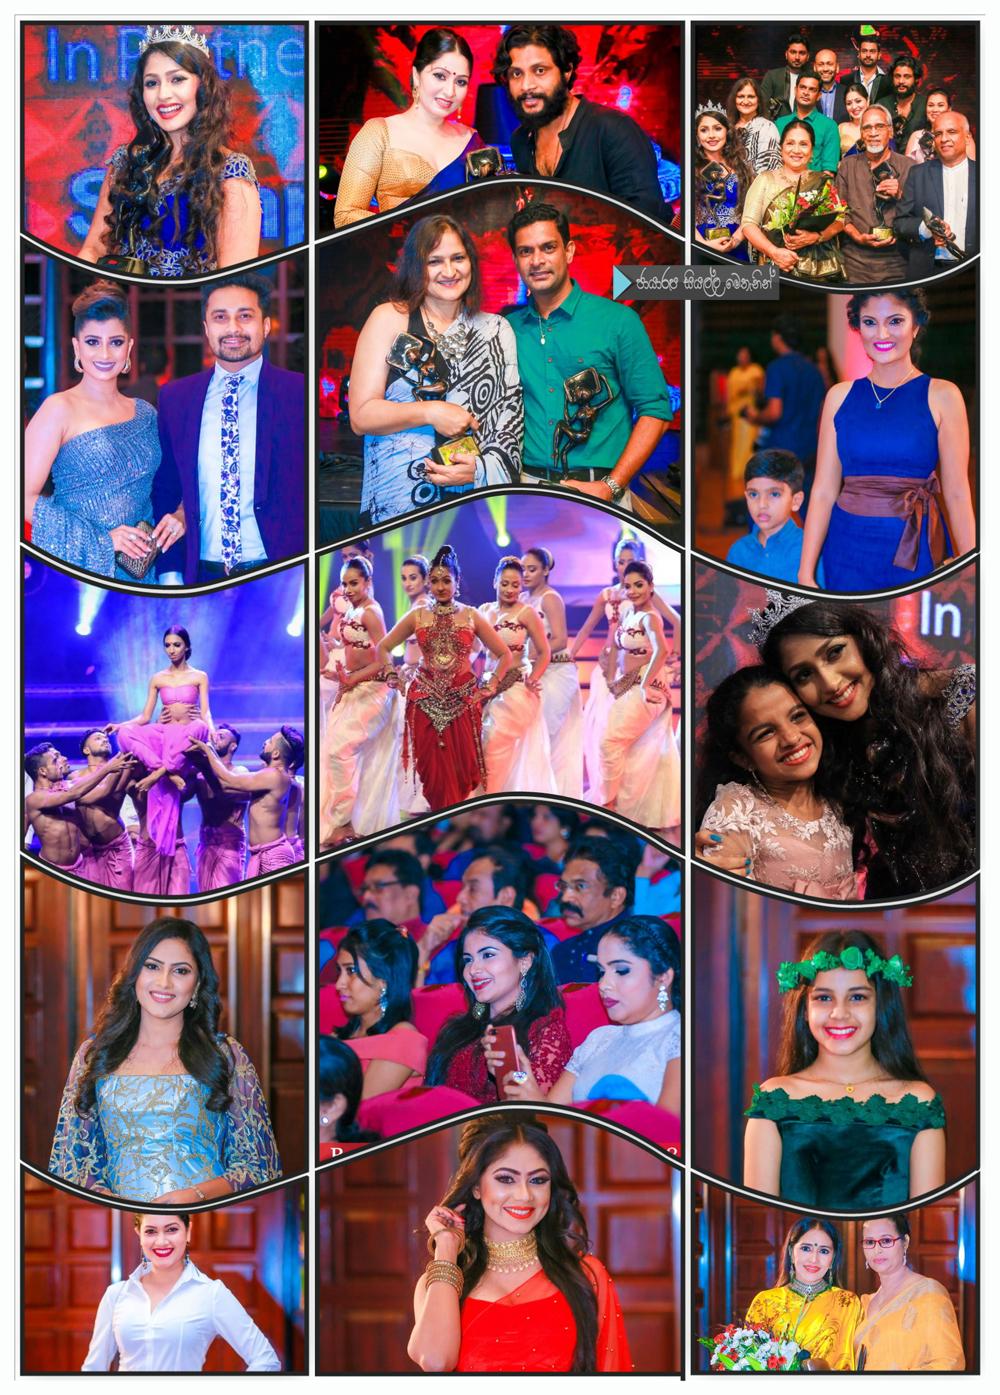 https://gallery.gossiplankanews.com/event/raigam-tele-awards-2018.html